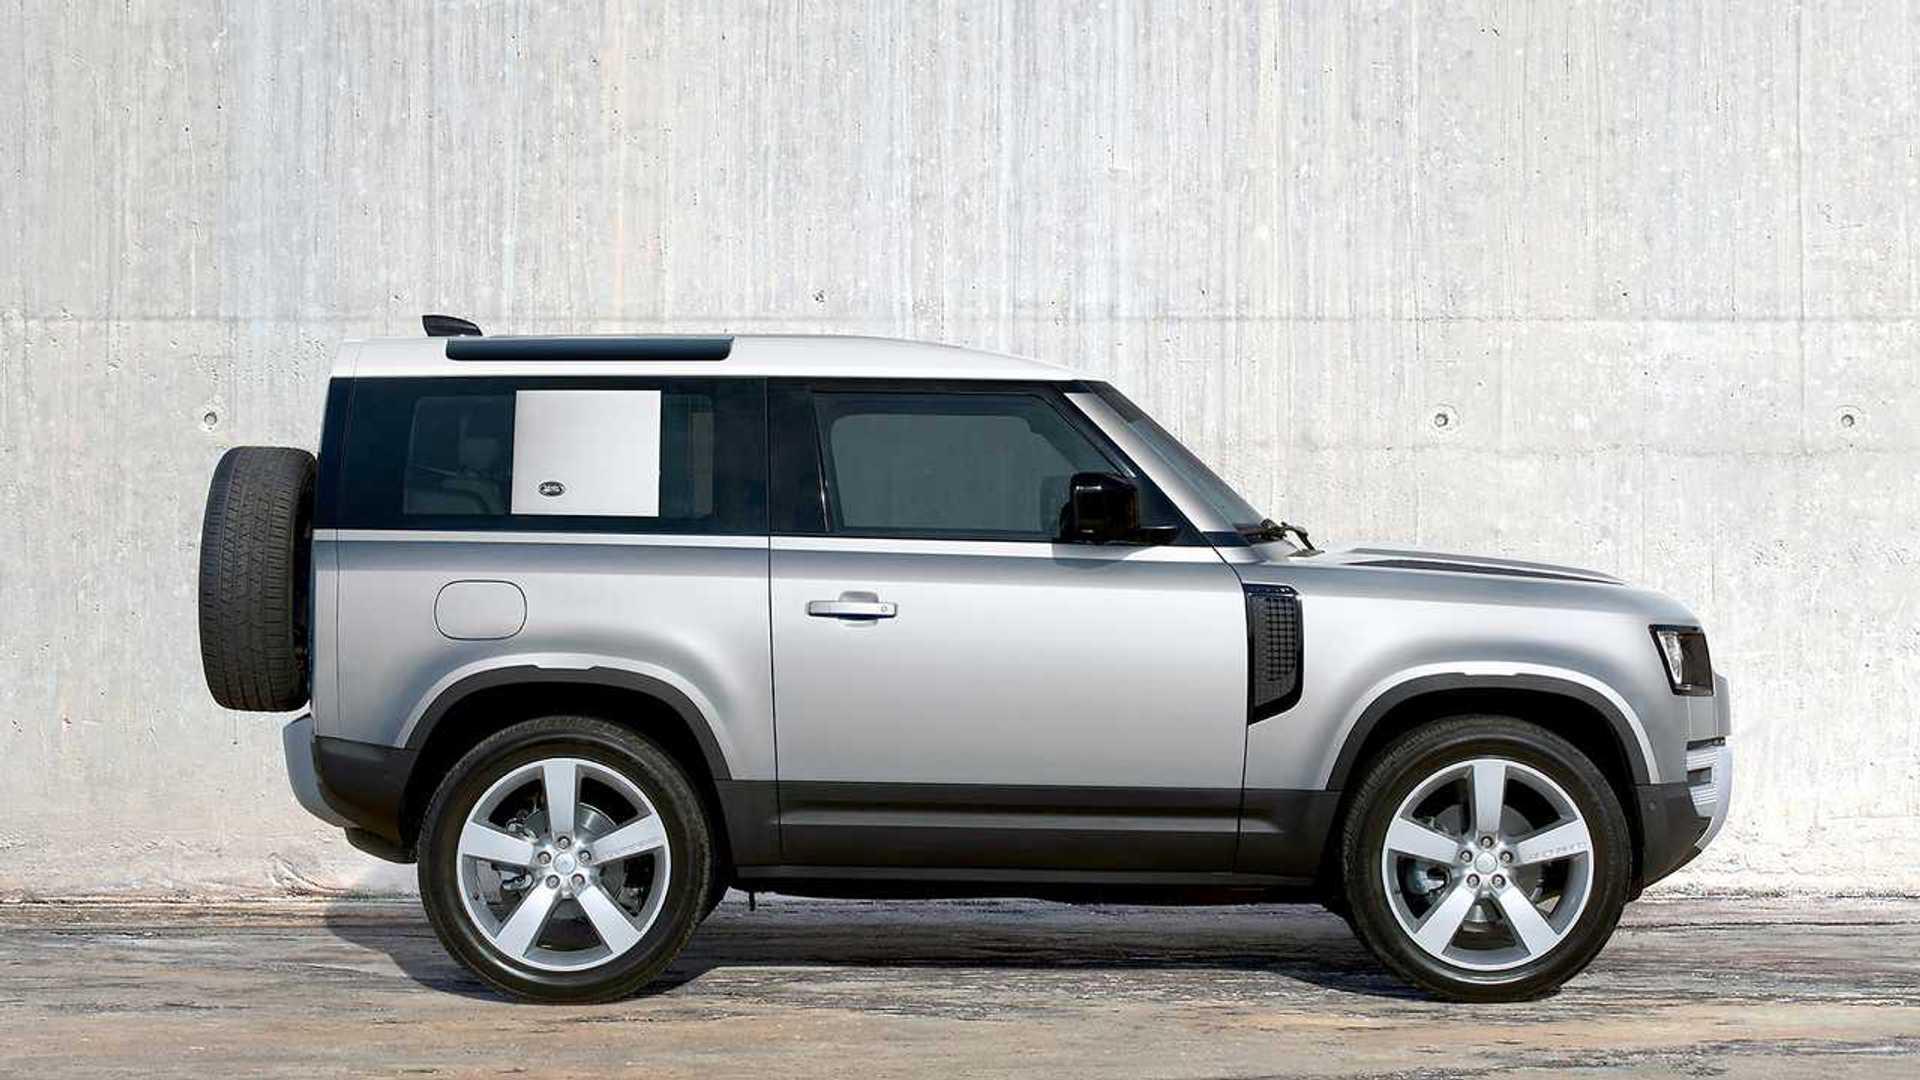 2020 Land Rover Defender Videos Highlight The Modernized Off-Roader